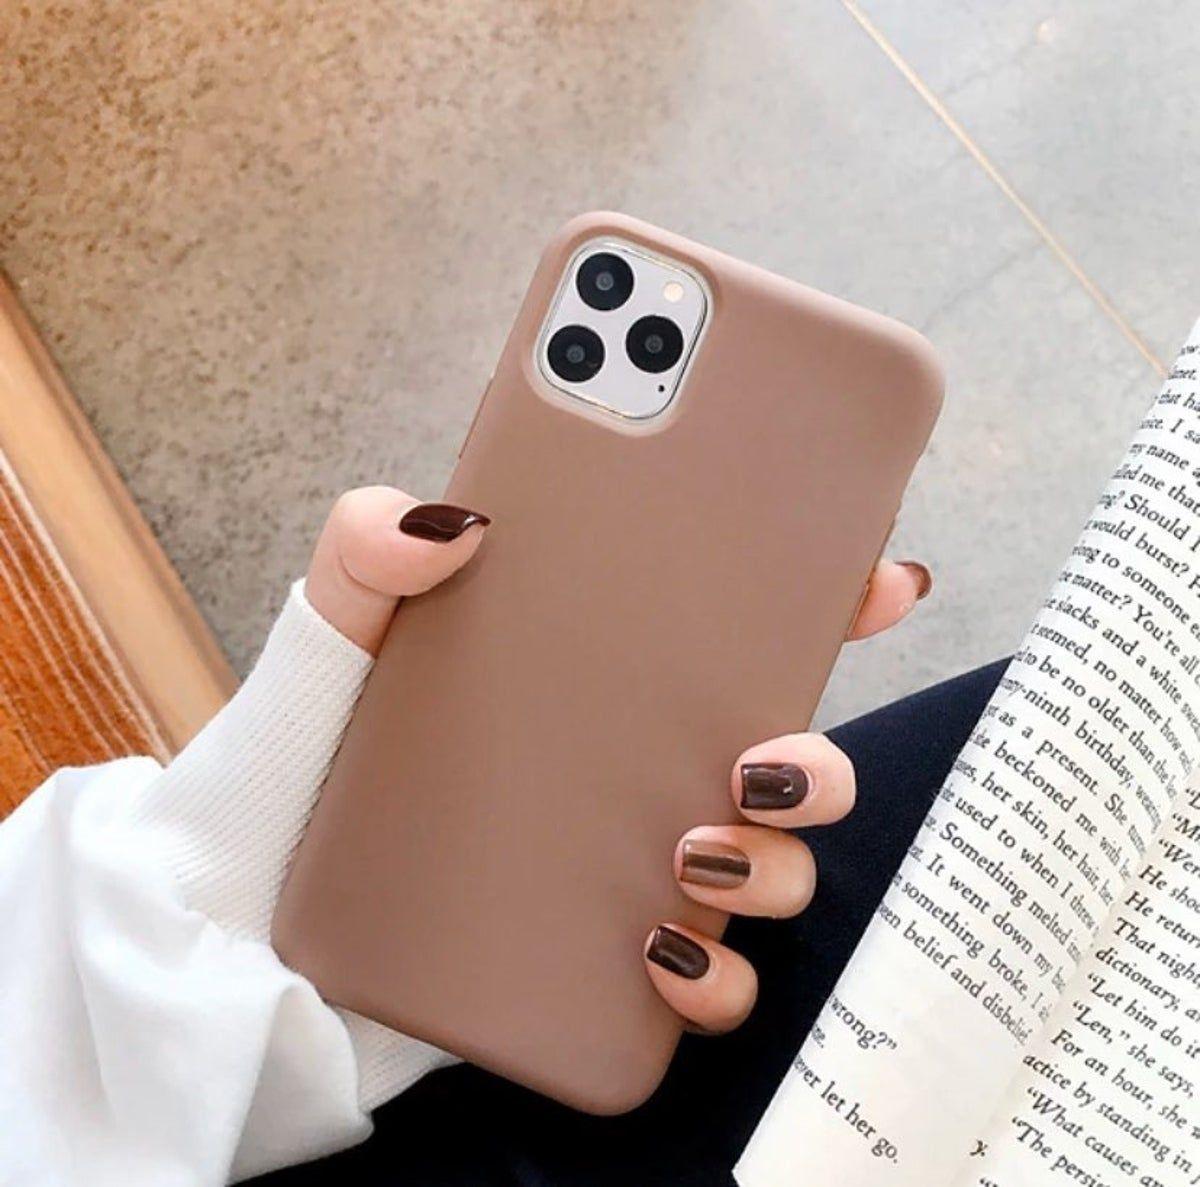 Samsung Wallpaper Music Hintergrundbild Tapete In 2020 Apple Phone Case Iphone Phone Iphone Phone Cases